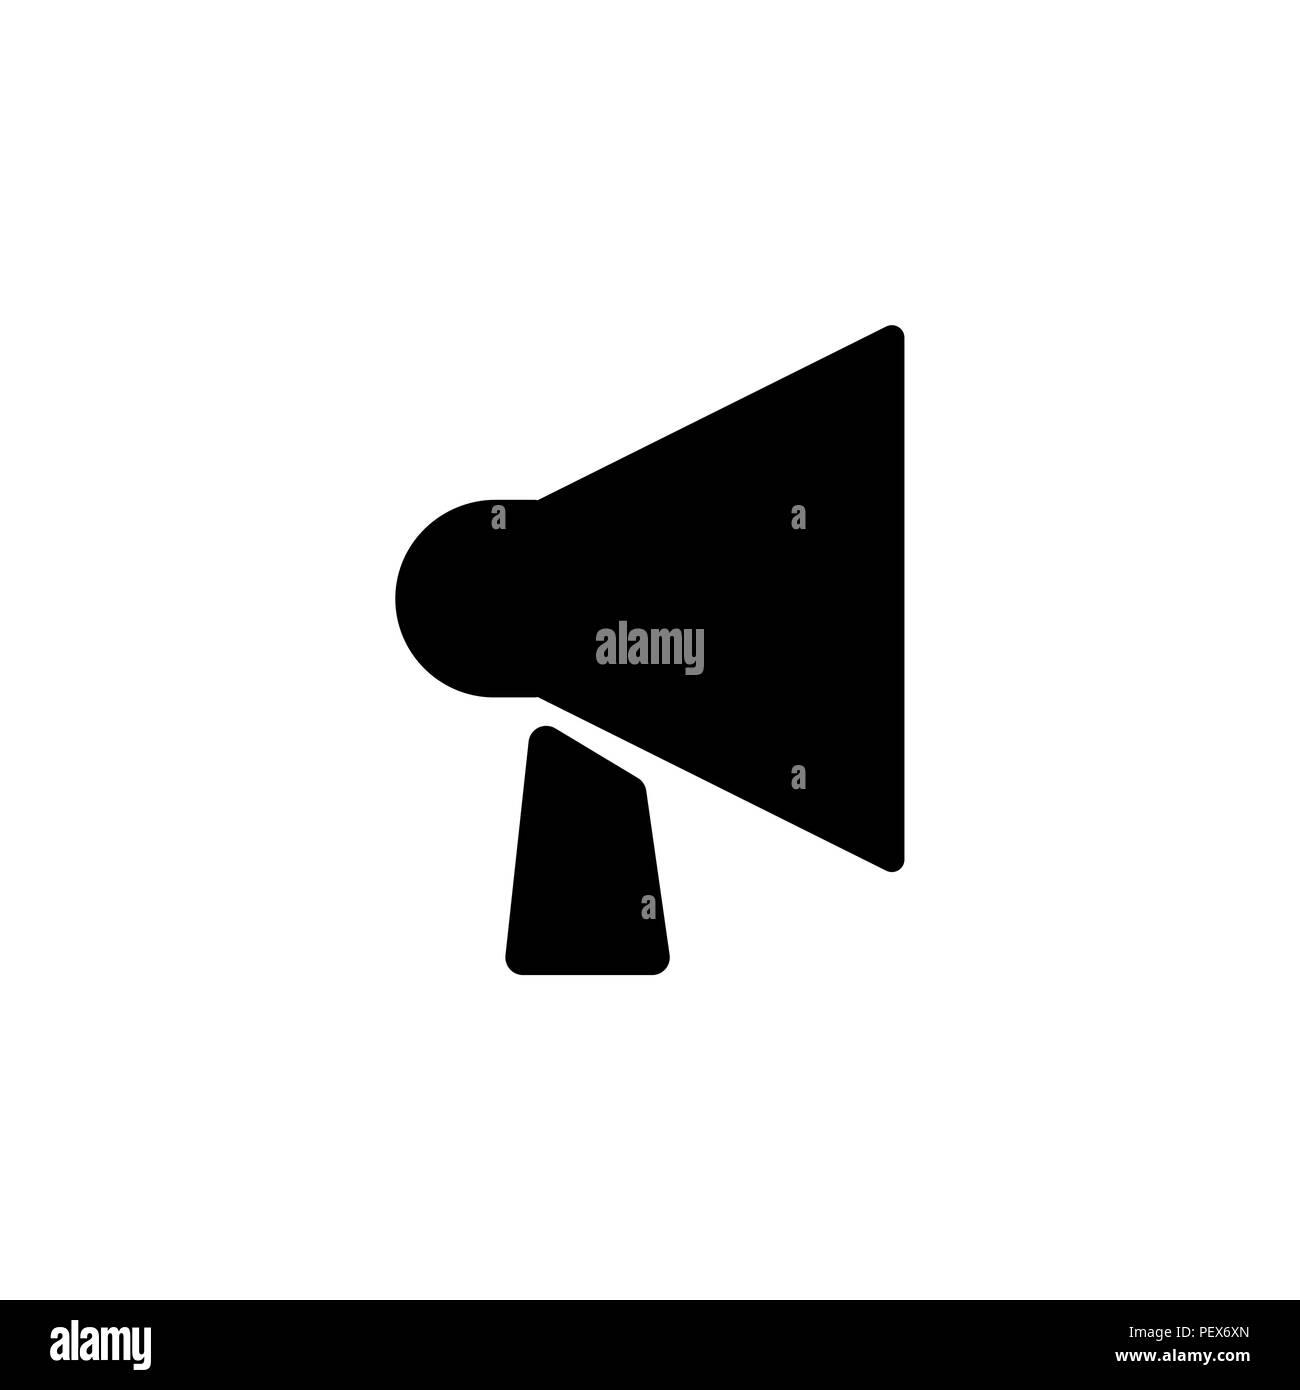 mouthpiece icon. vector illustration black on white background - Stock Image